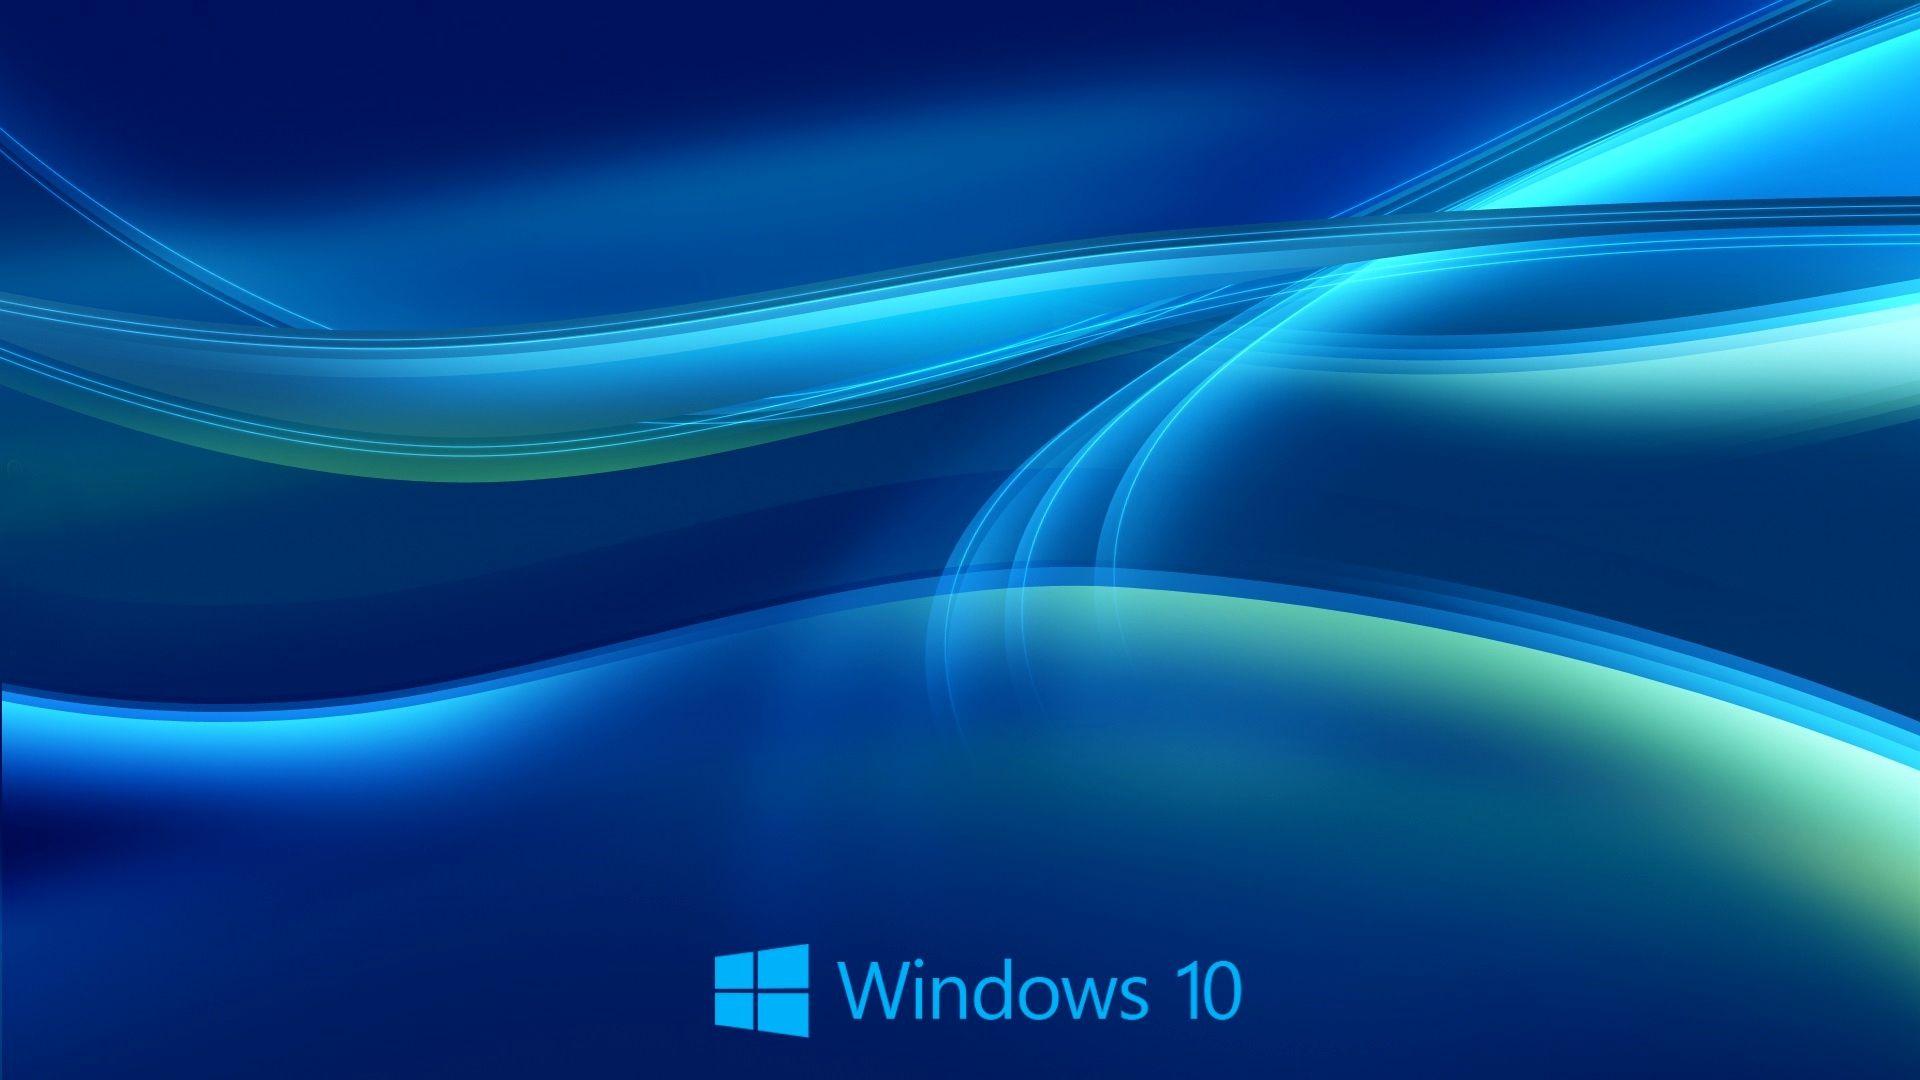 Windows 10 Background Pictures Trick Windows 10 Windows 10 Desktop Backgrounds Wallpaper Windows 10